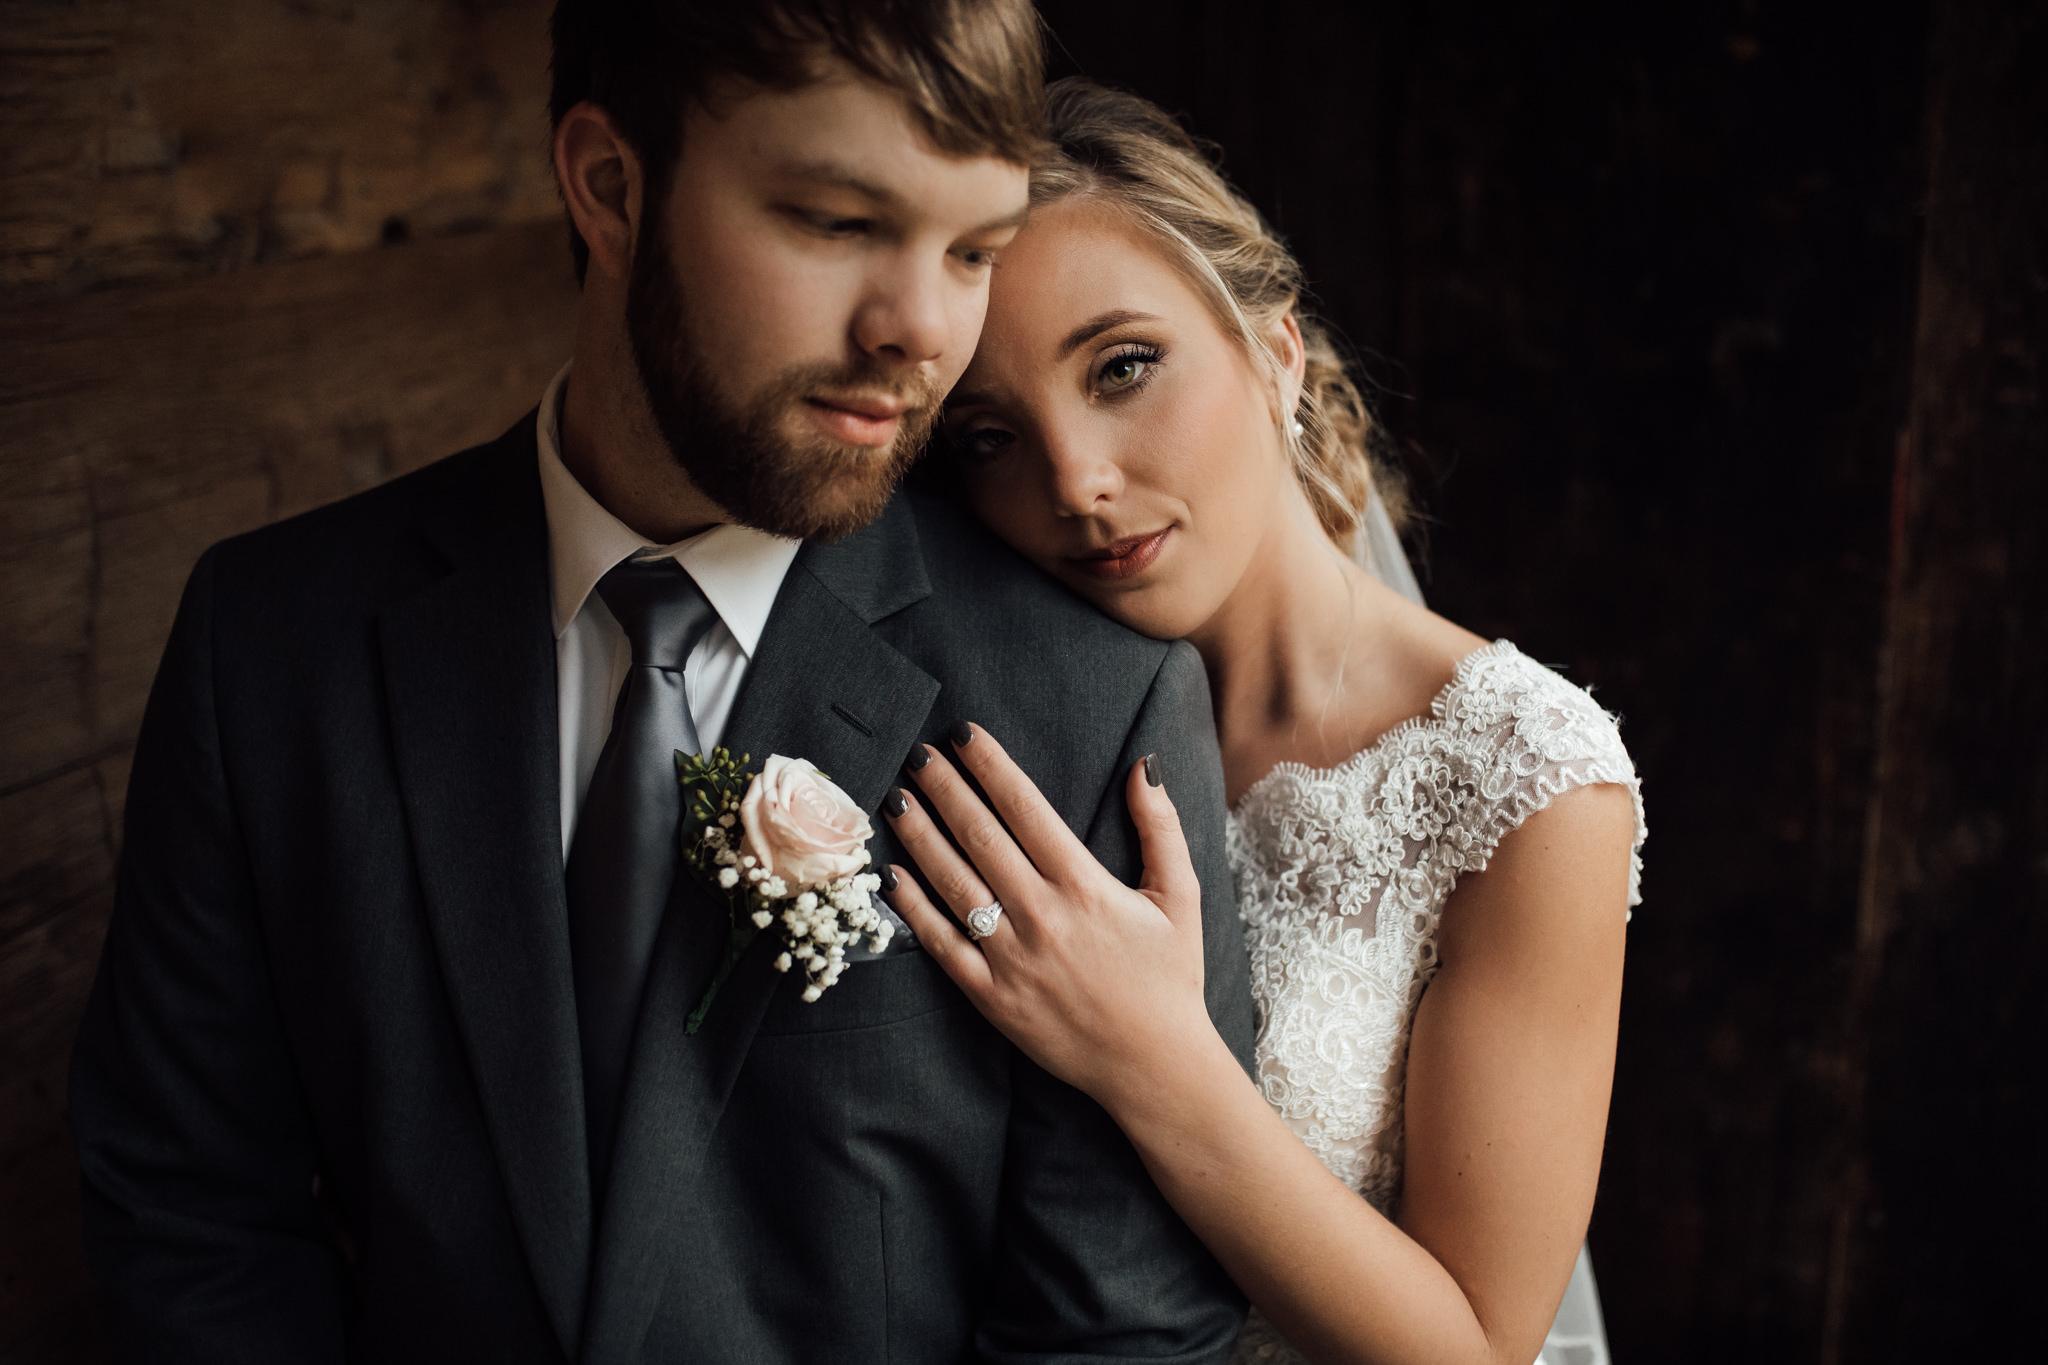 memphis-wedding-photographer-mallards-croft-wedding-venue-cassie-cook-photography-57.jpg